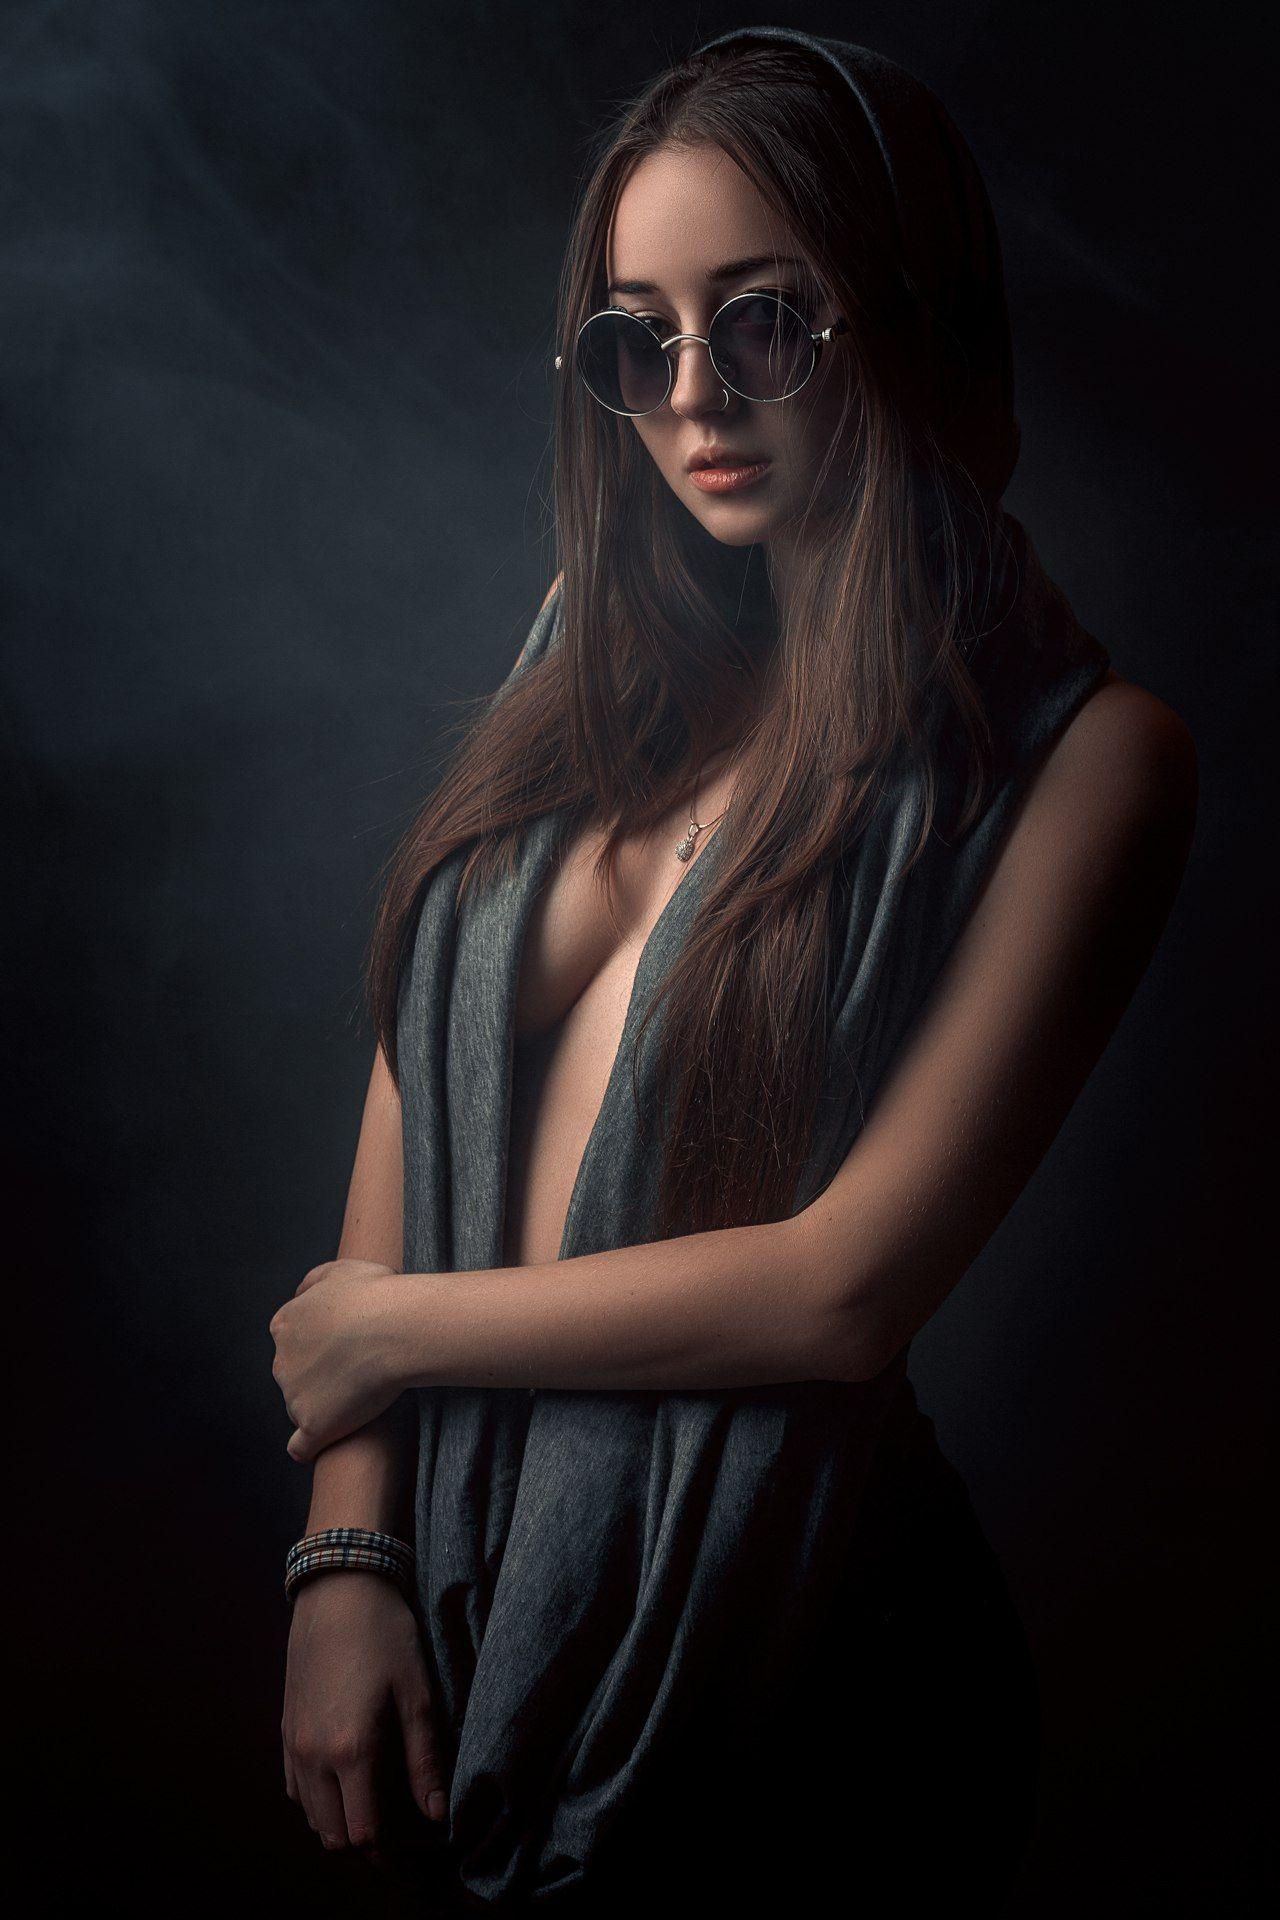 girl, model, portrait, light, eyes, emotion, hair, beauty, девушка, модель, свет, контраст, глаза, взгляд, эмоции, красота, Гладков Степан